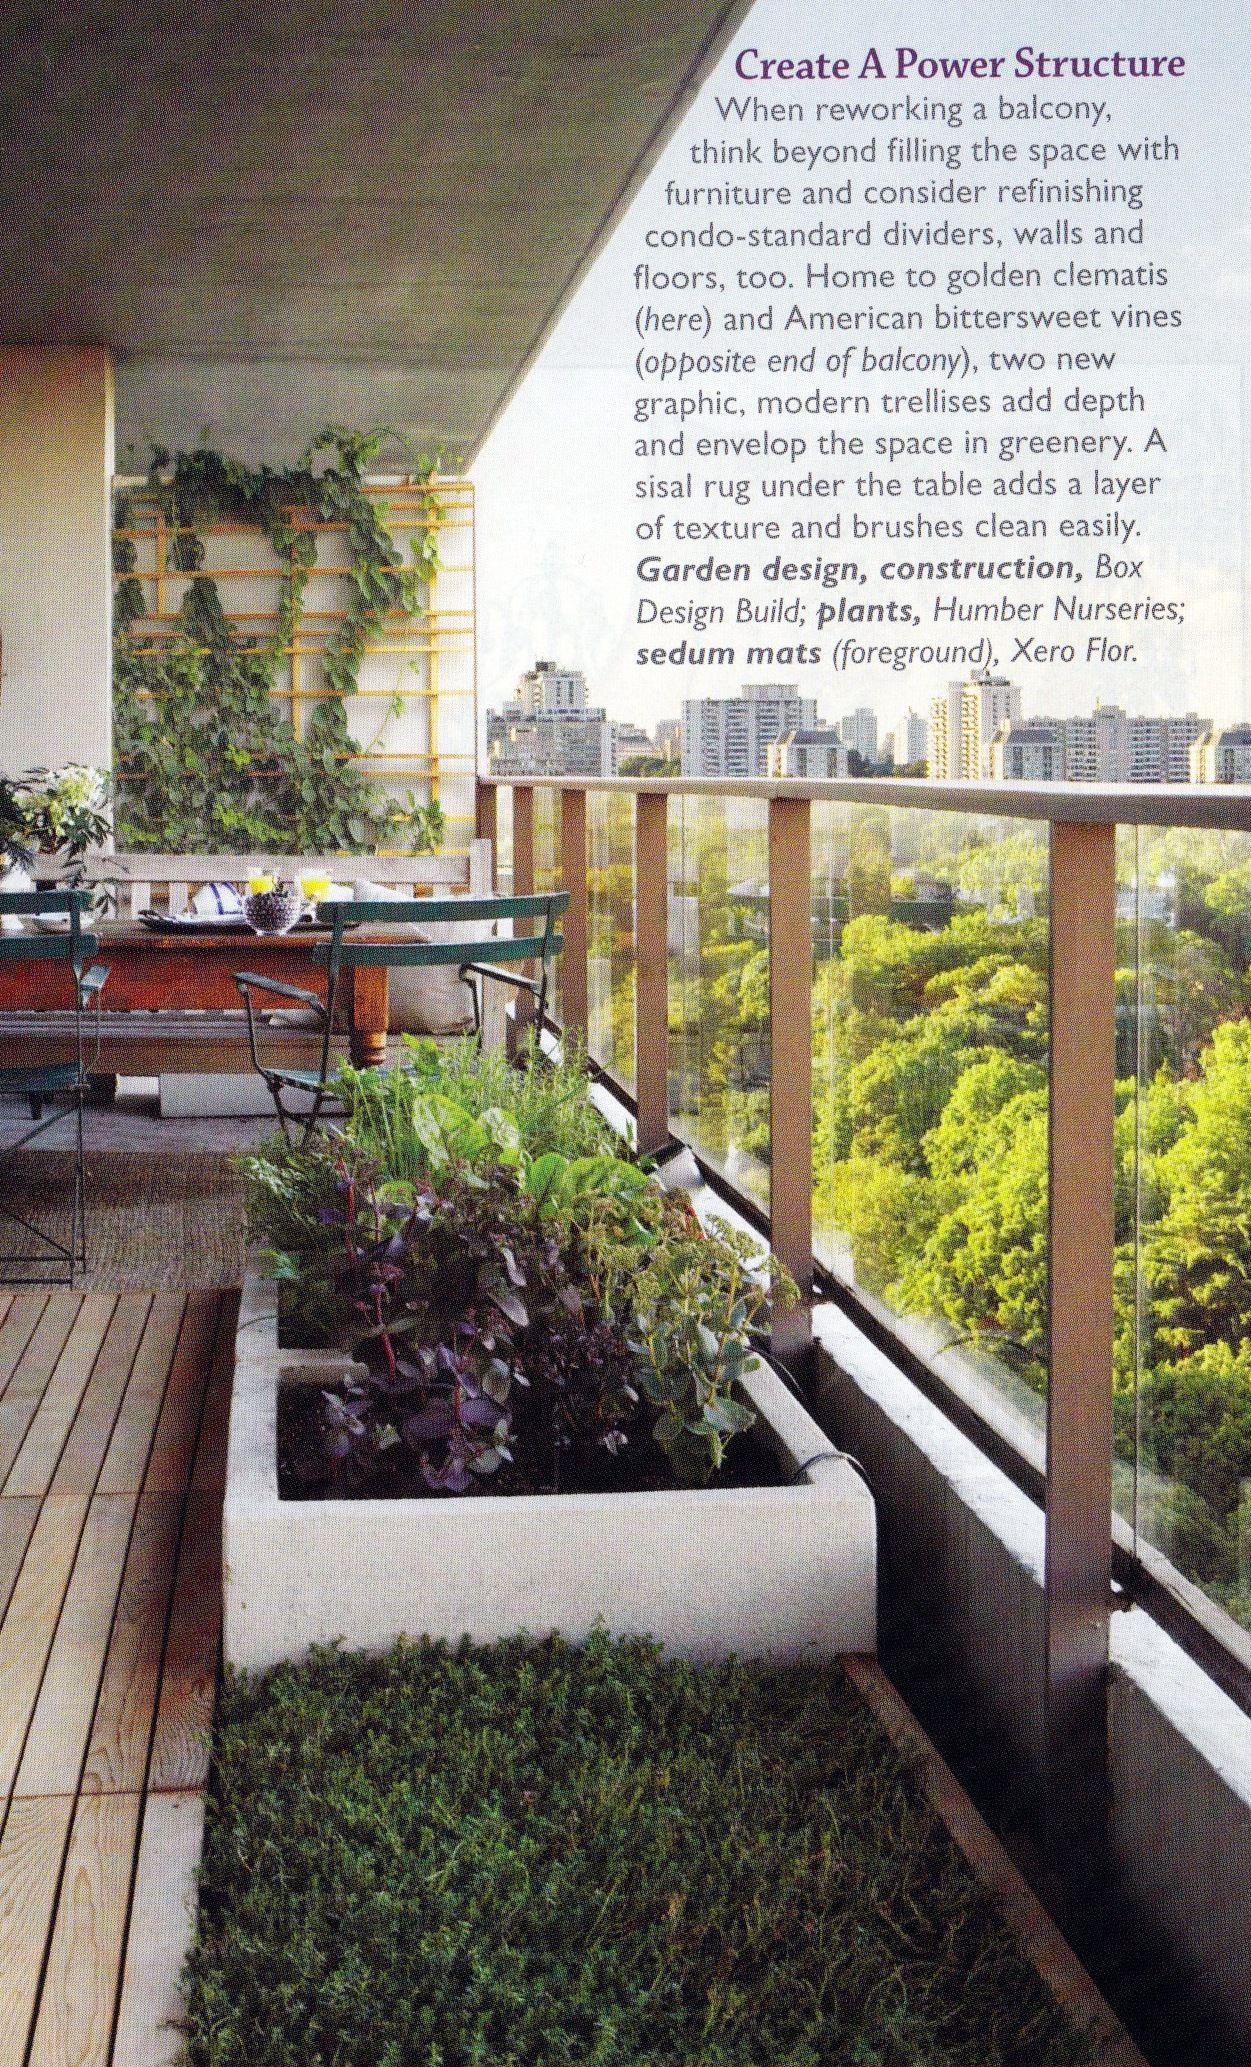 49 Modern Balcony Grill Railing Designs Of Steel Iron: Interior Design Magazine On Outdoors